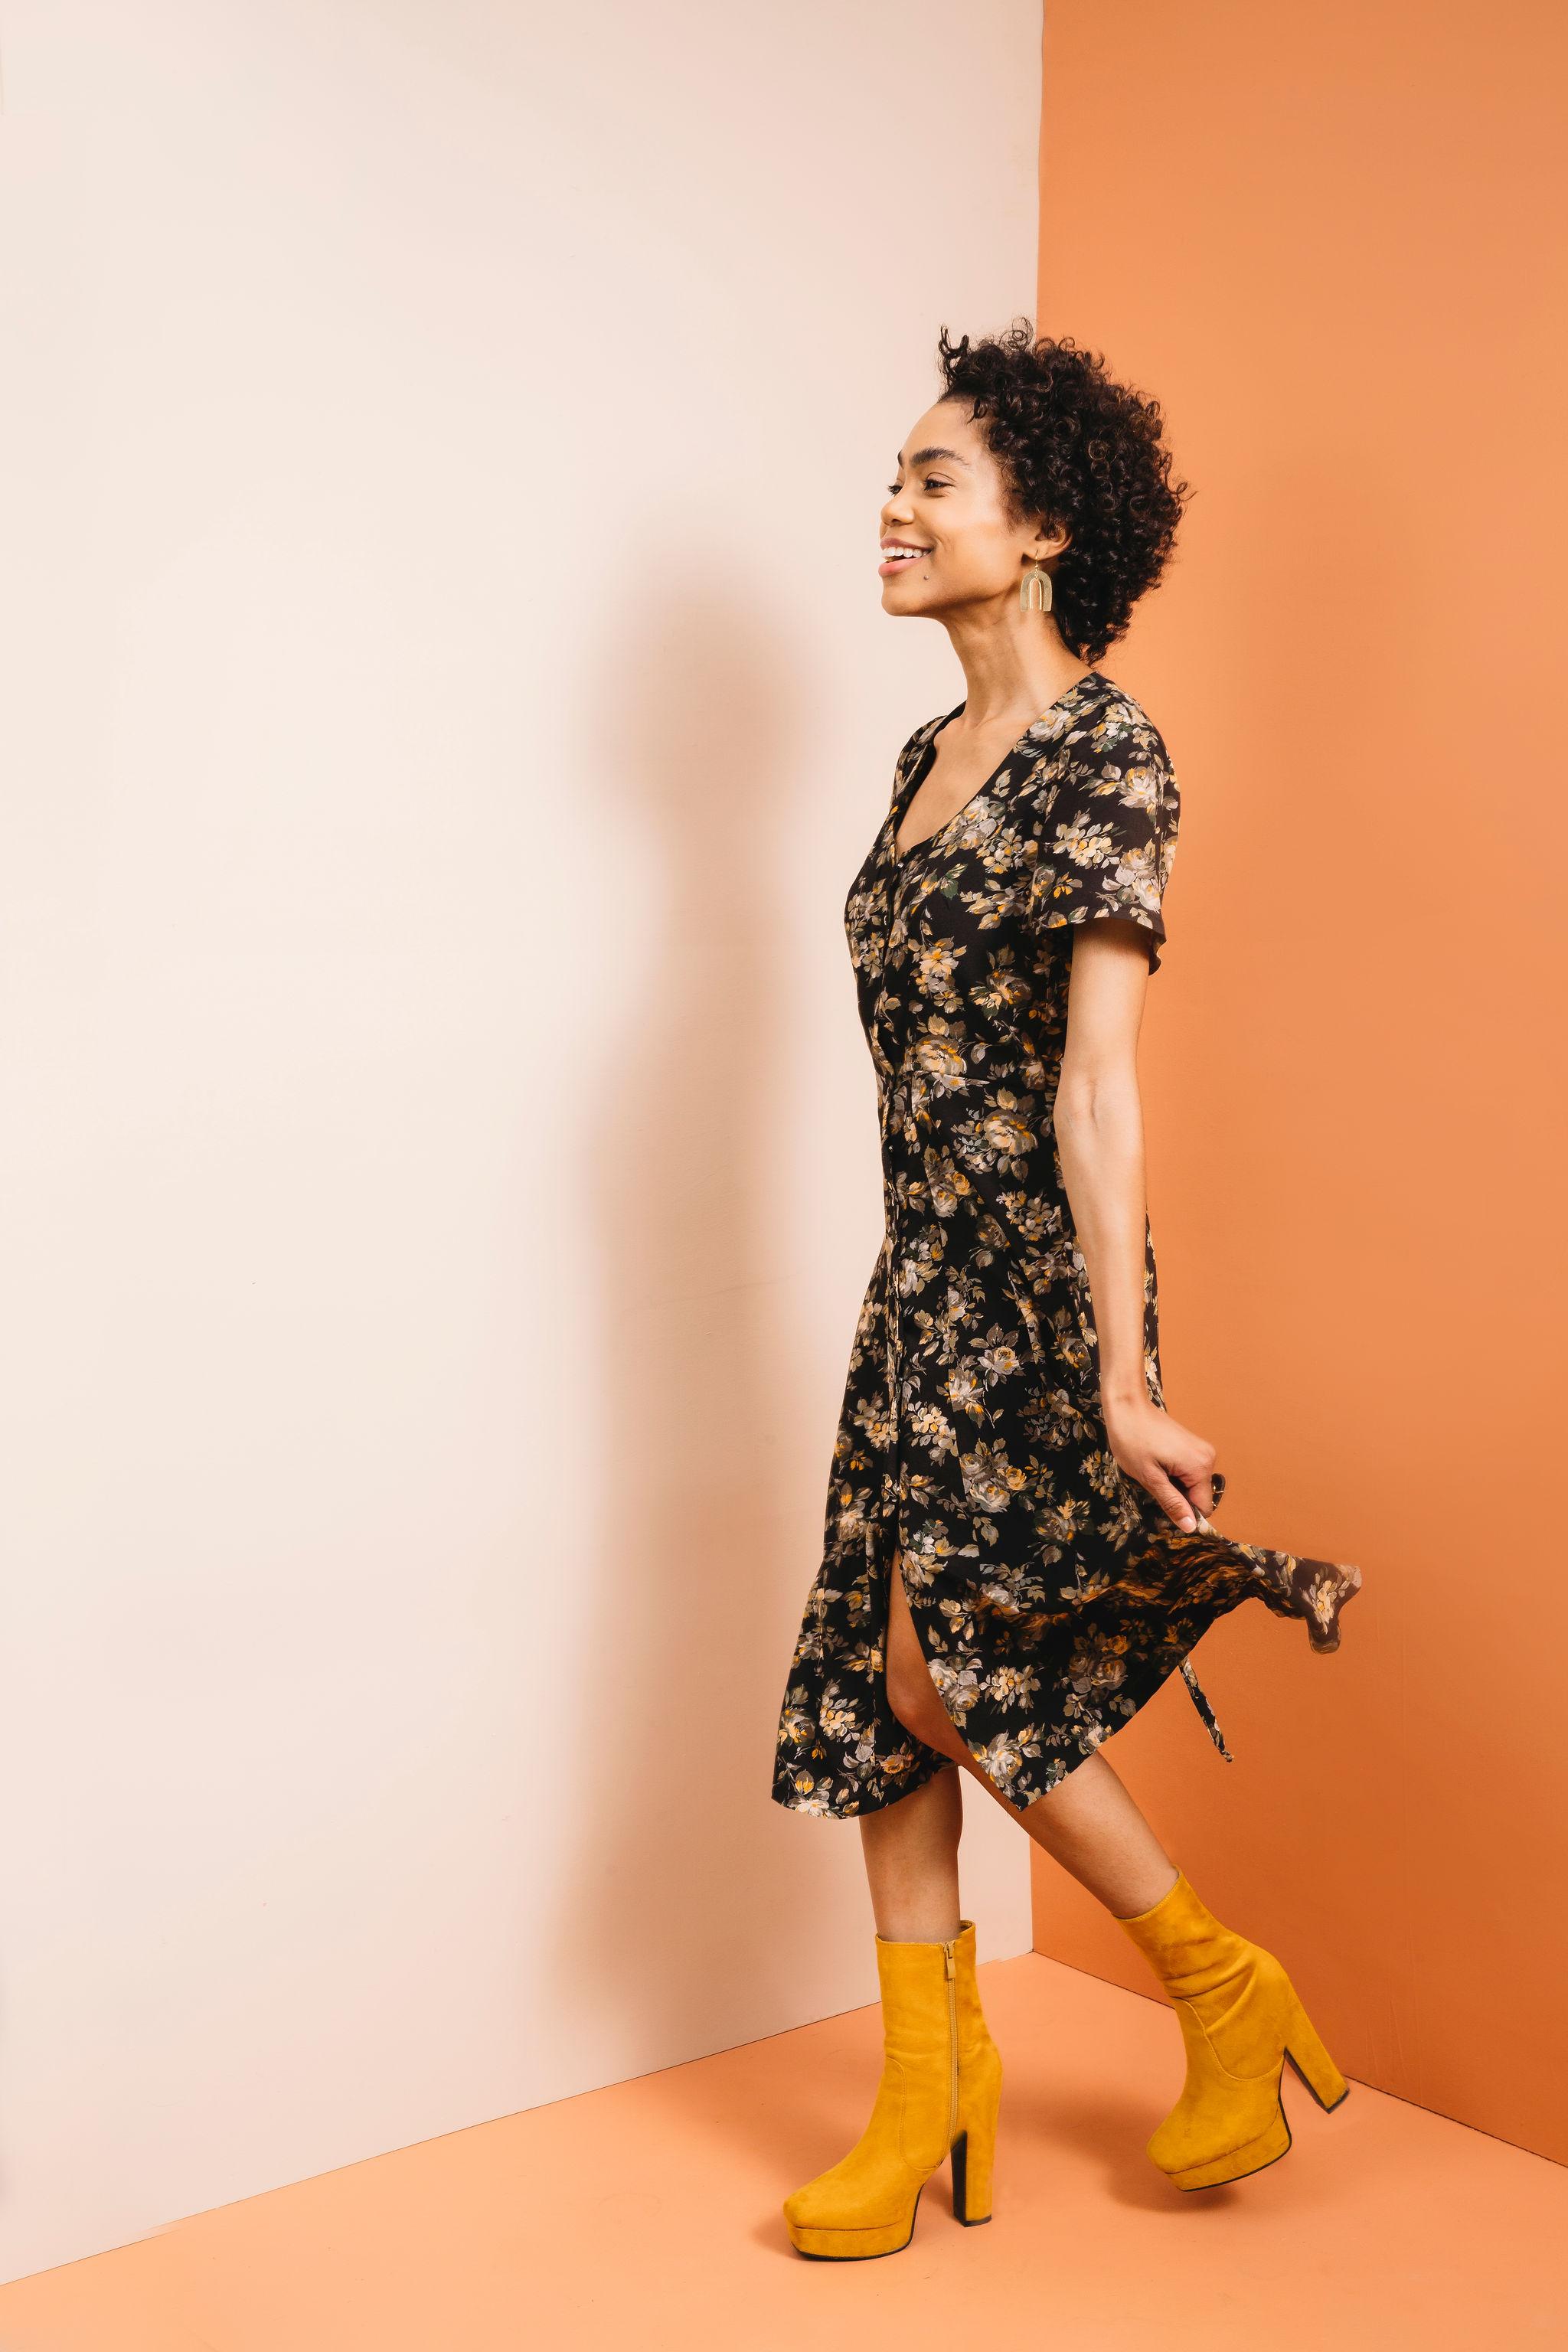 Hughes Dress Sewing Pattern - Friday Pattern Co - 7.jpg